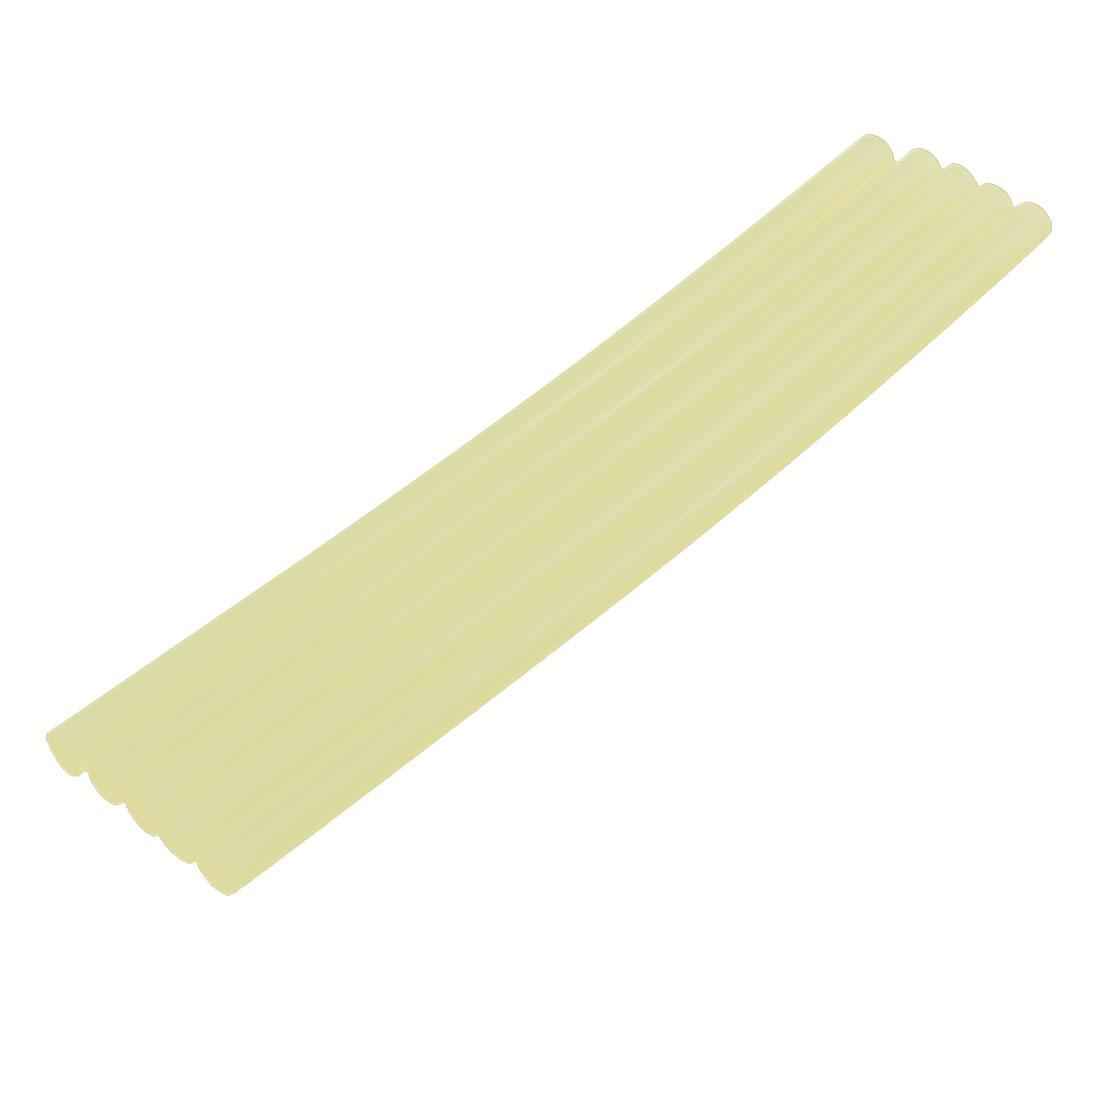 5 Pcs 11mm x 280mm Hot Melt Glue Adhesive Stick Yellow for Electric Tool Heating Gun